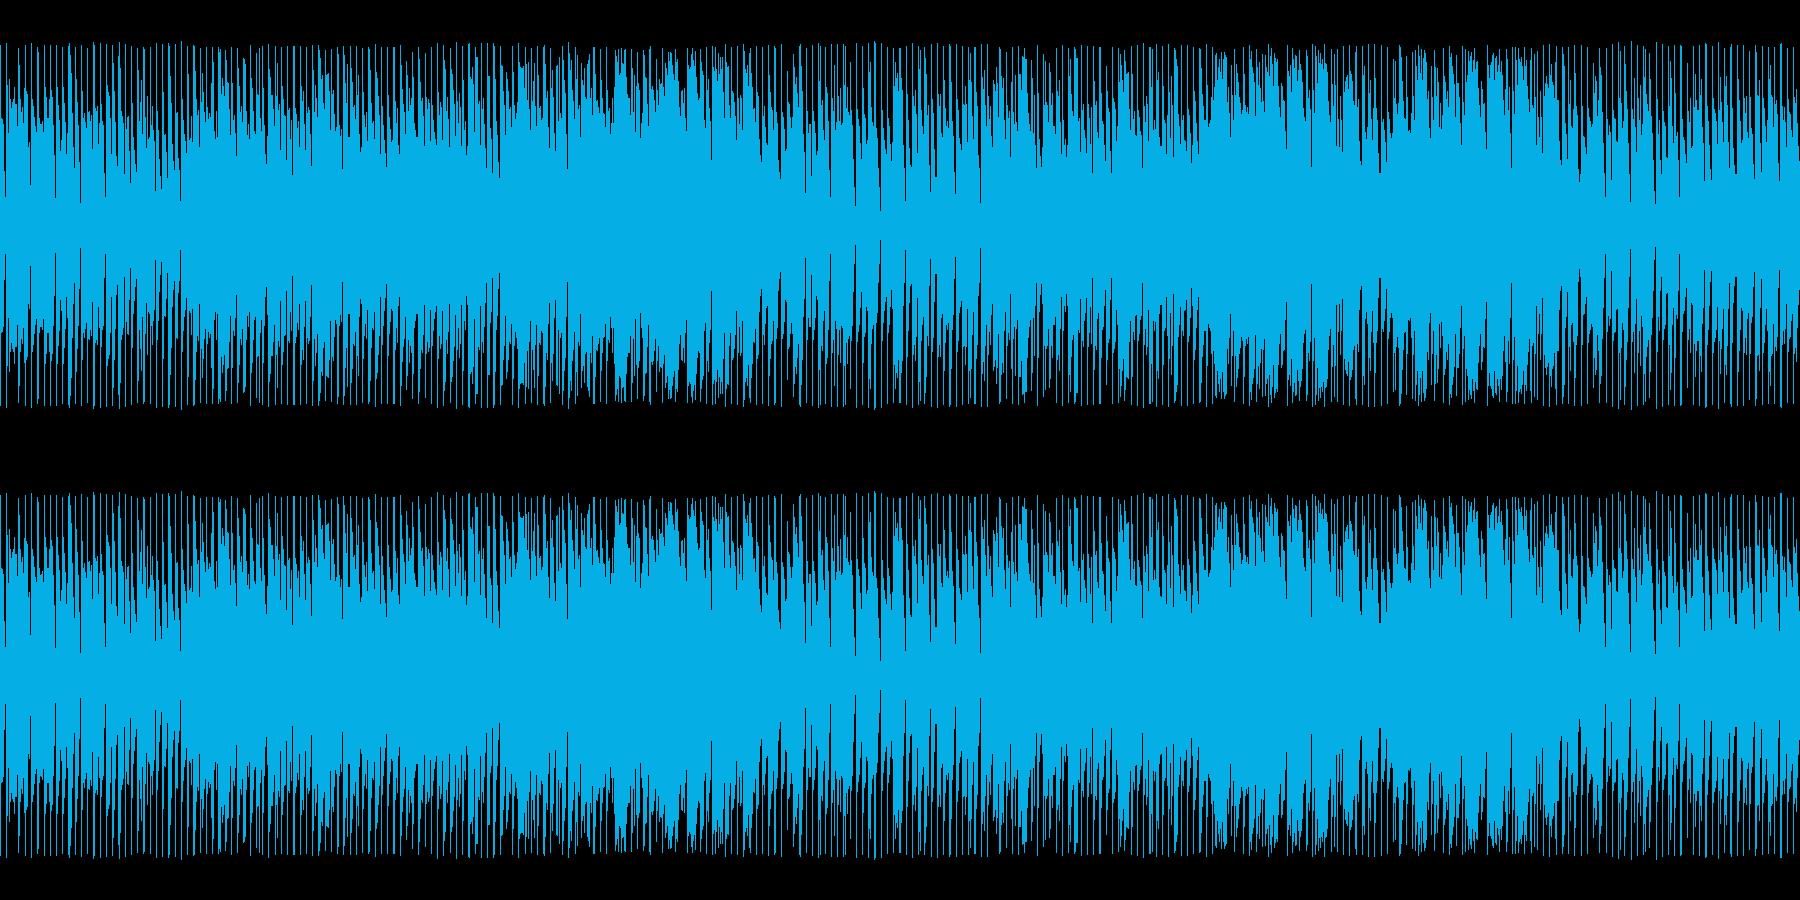 BGM007-05 チップチューンの穏…の再生済みの波形